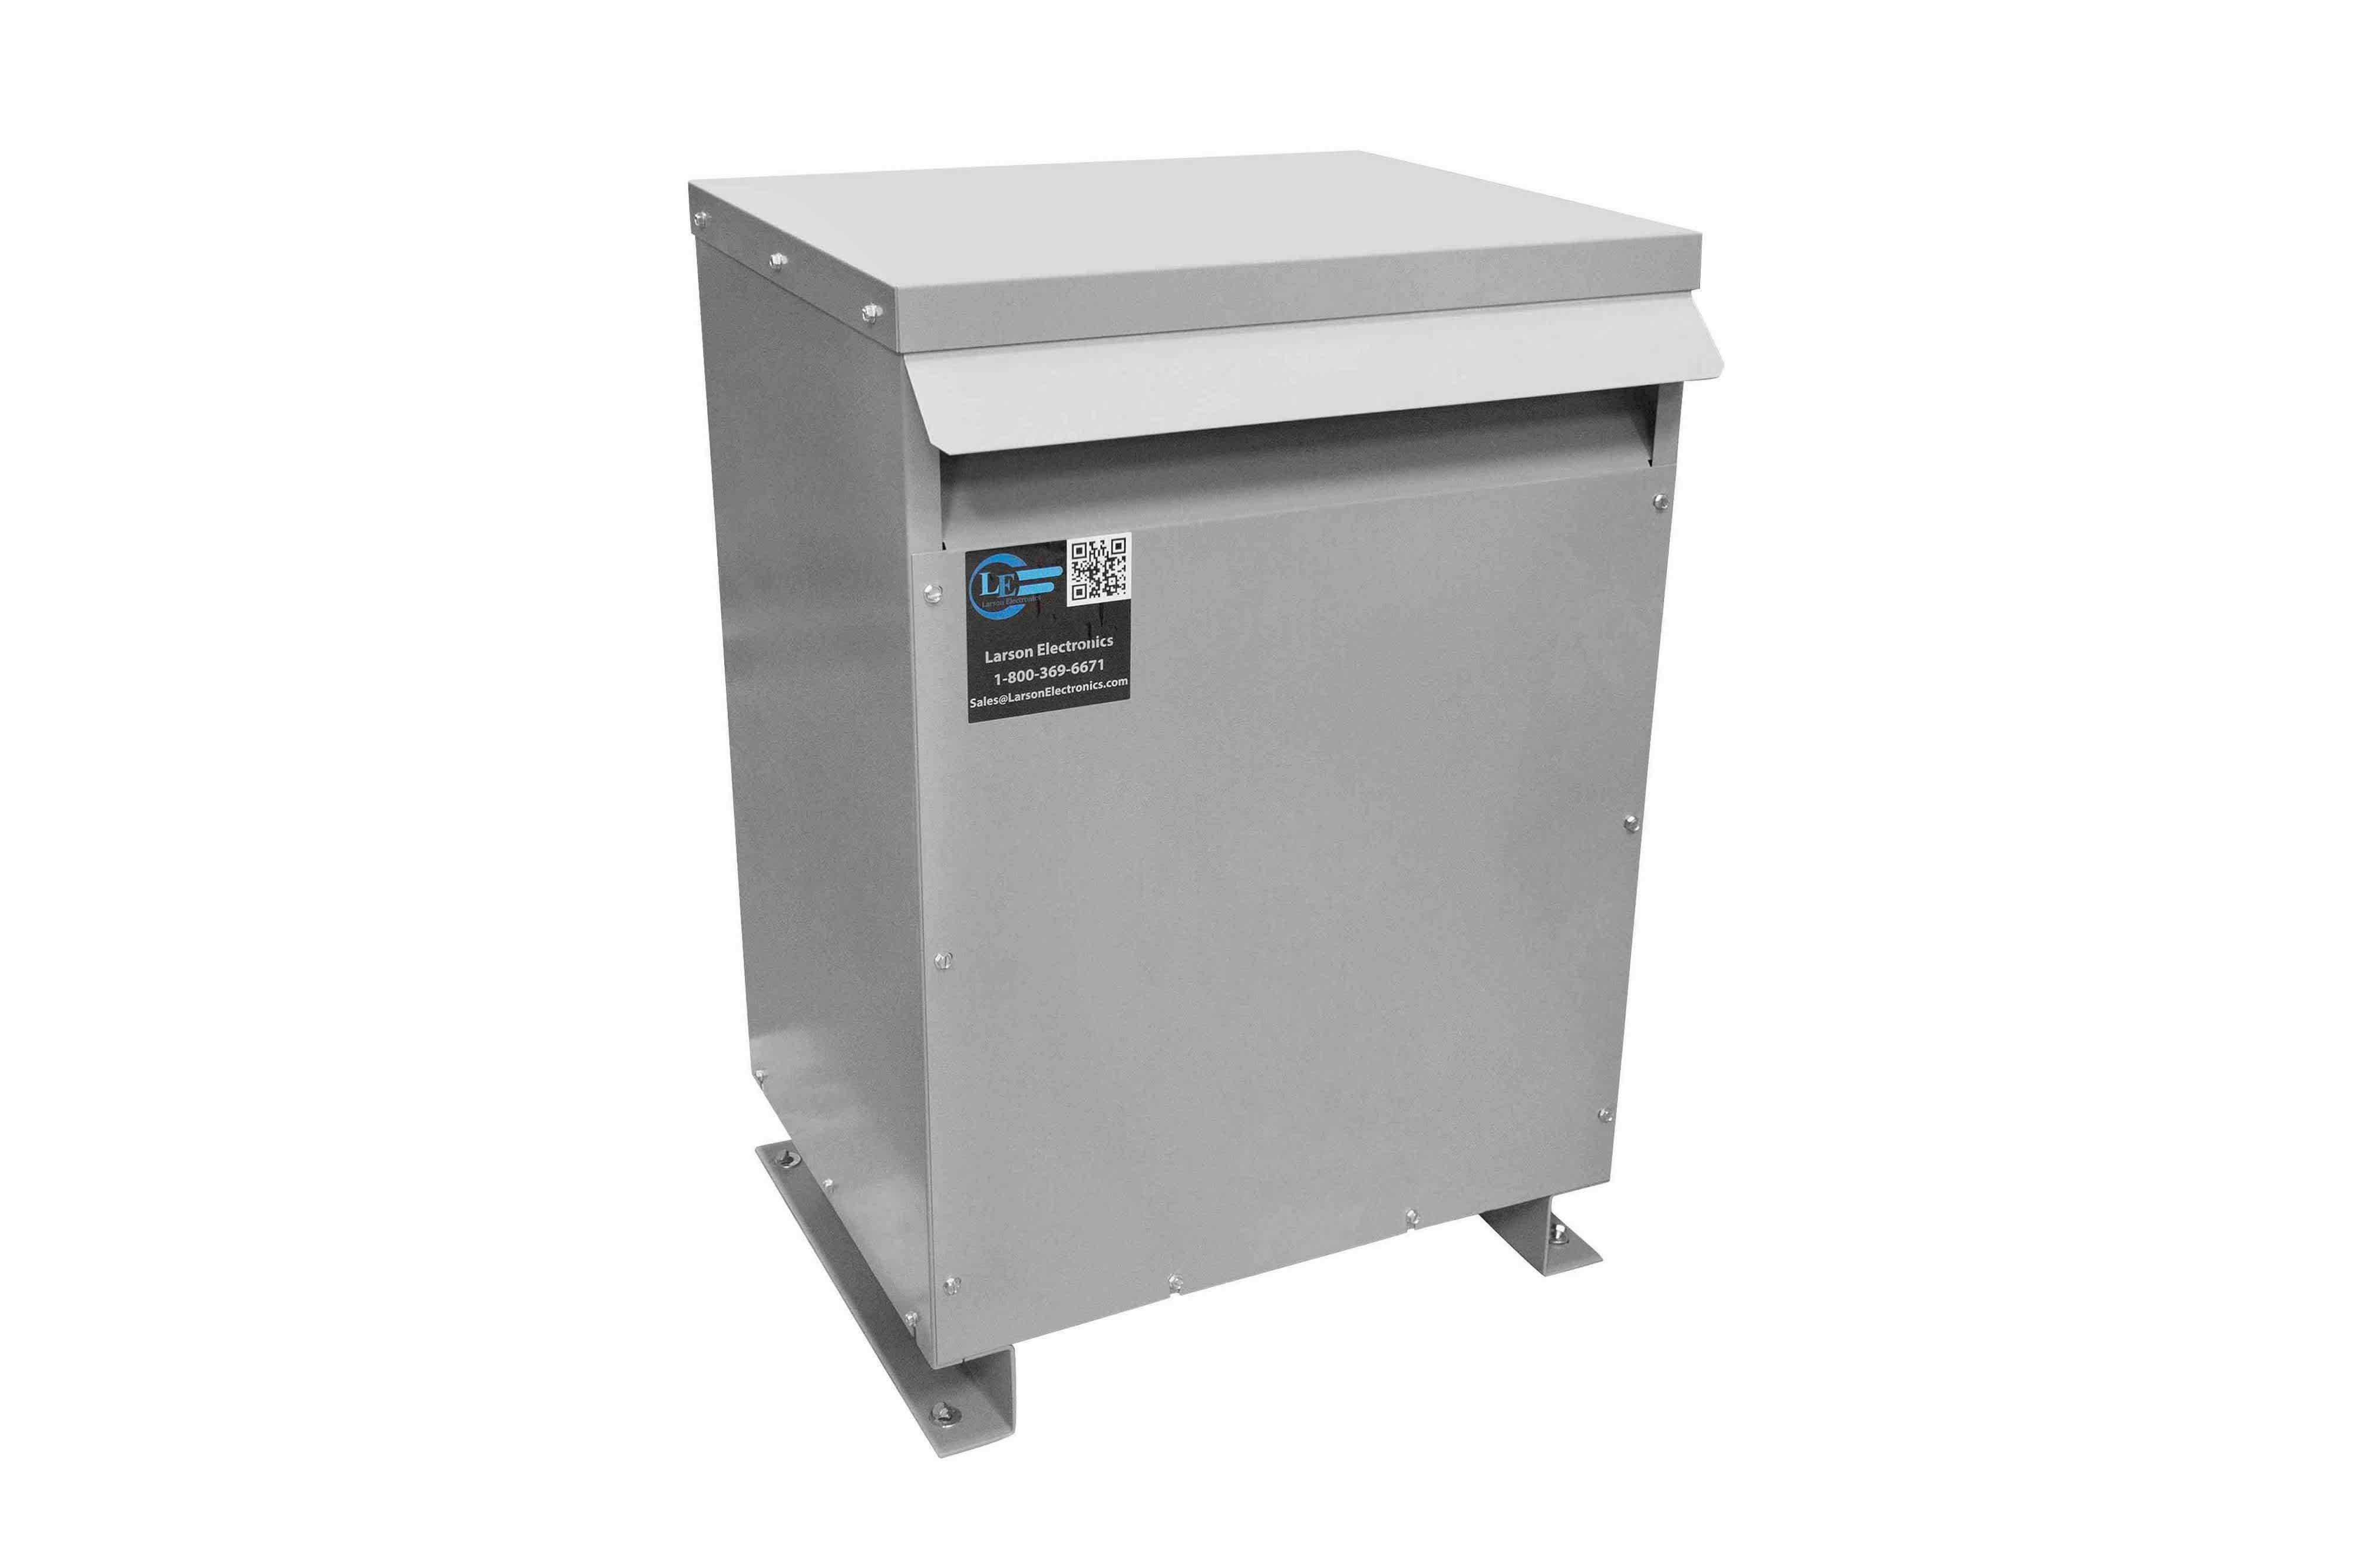 50 kVA 3PH DOE Transformer, 380V Delta Primary, 480Y/277 Wye-N Secondary, N3R, Ventilated, 60 Hz